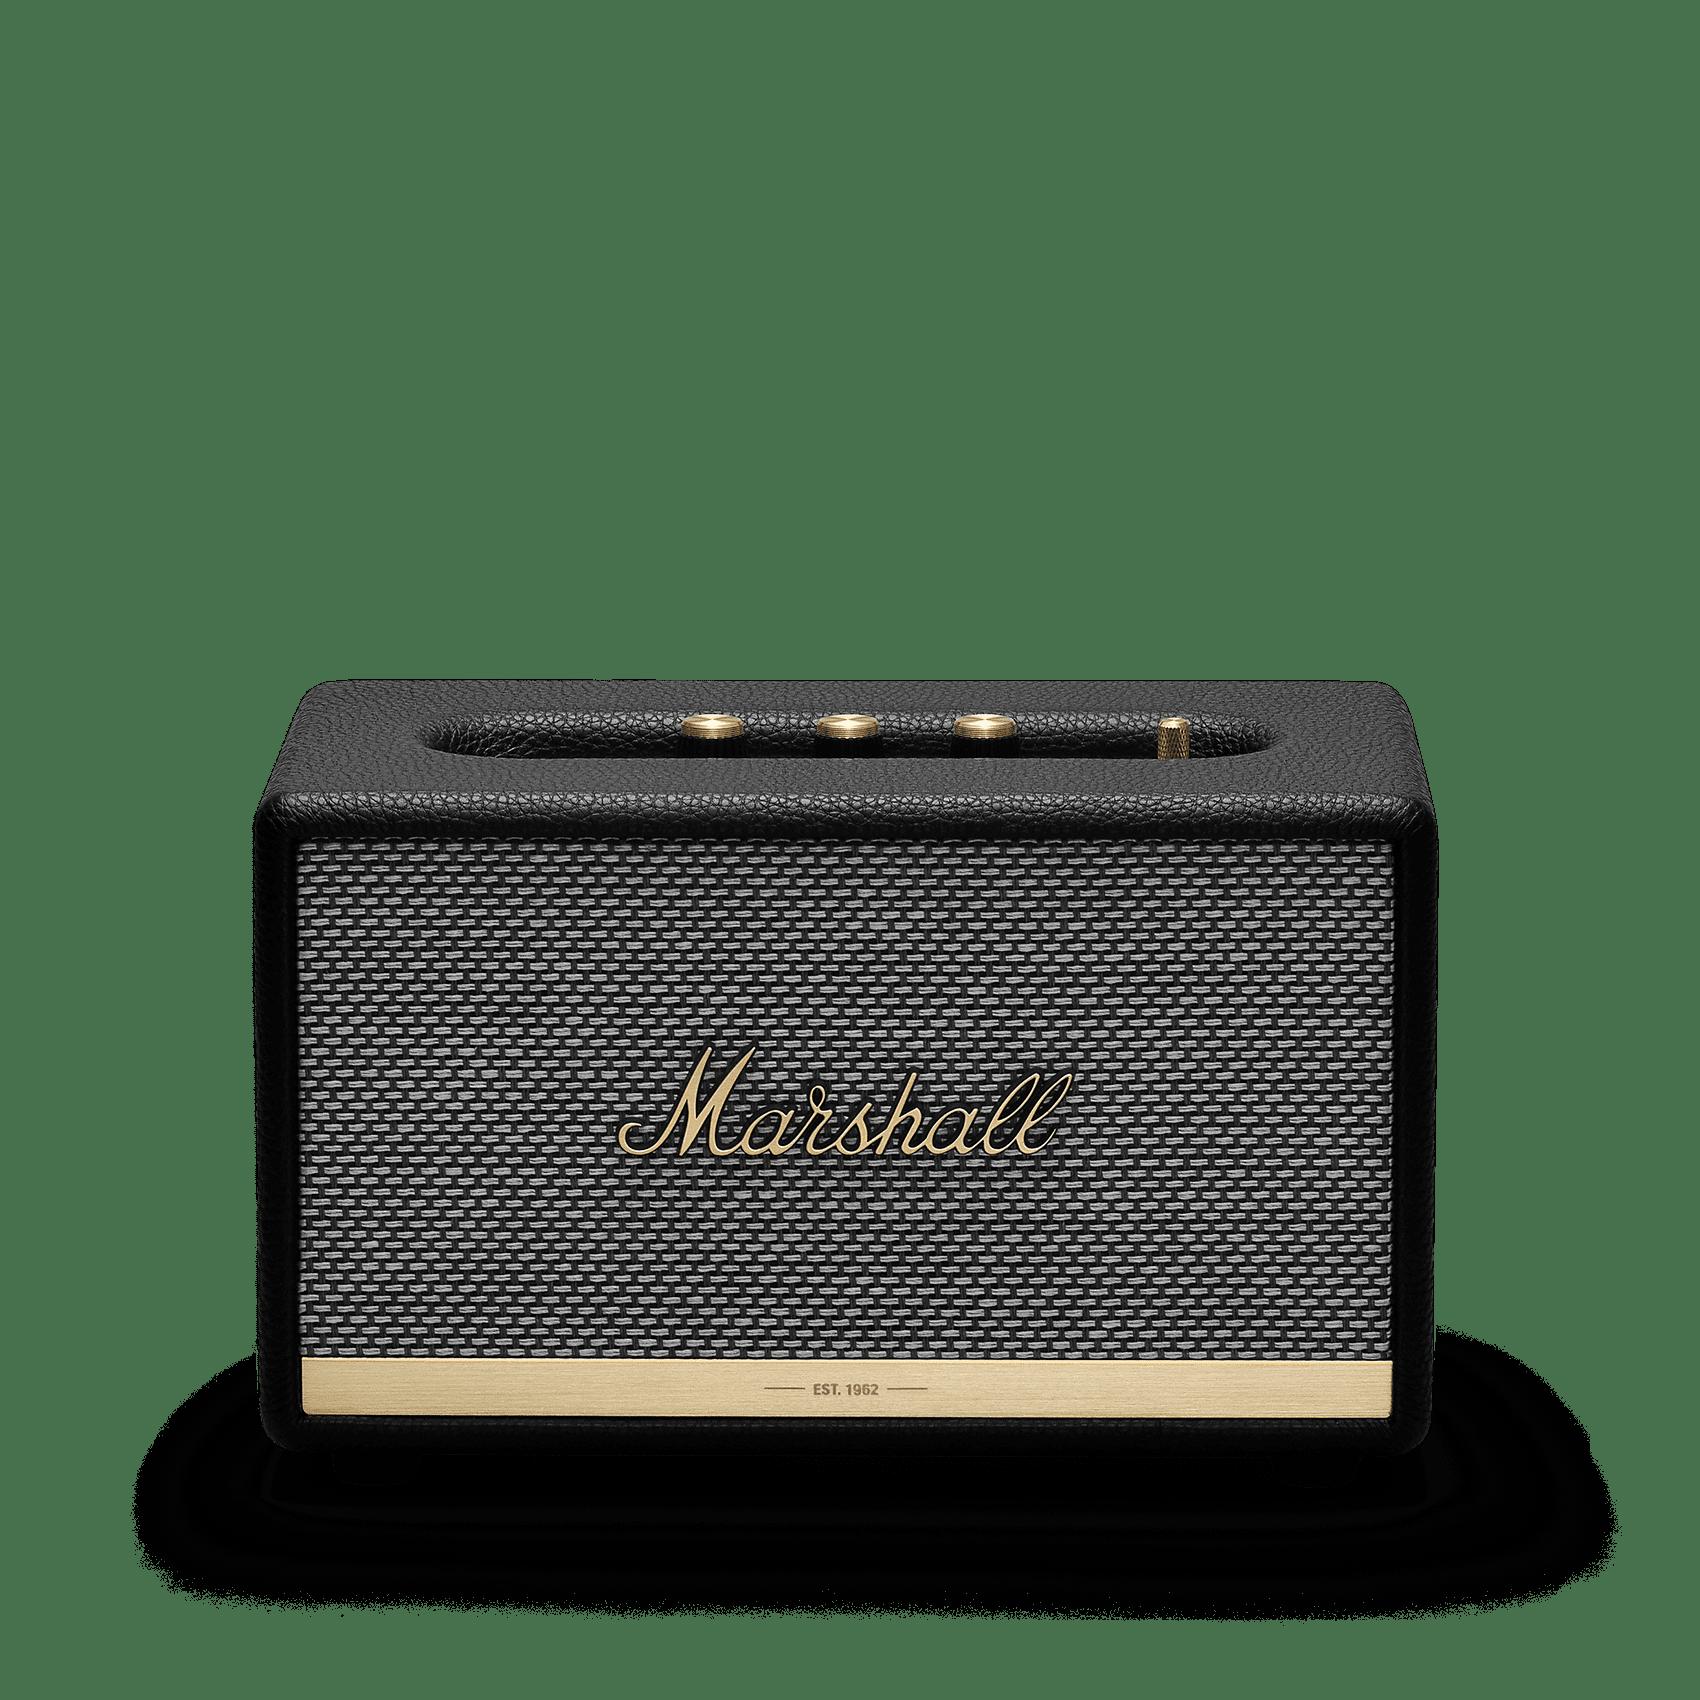 Buy Speakers And Home Audio Systems From Marshallheadphones Com Marshall